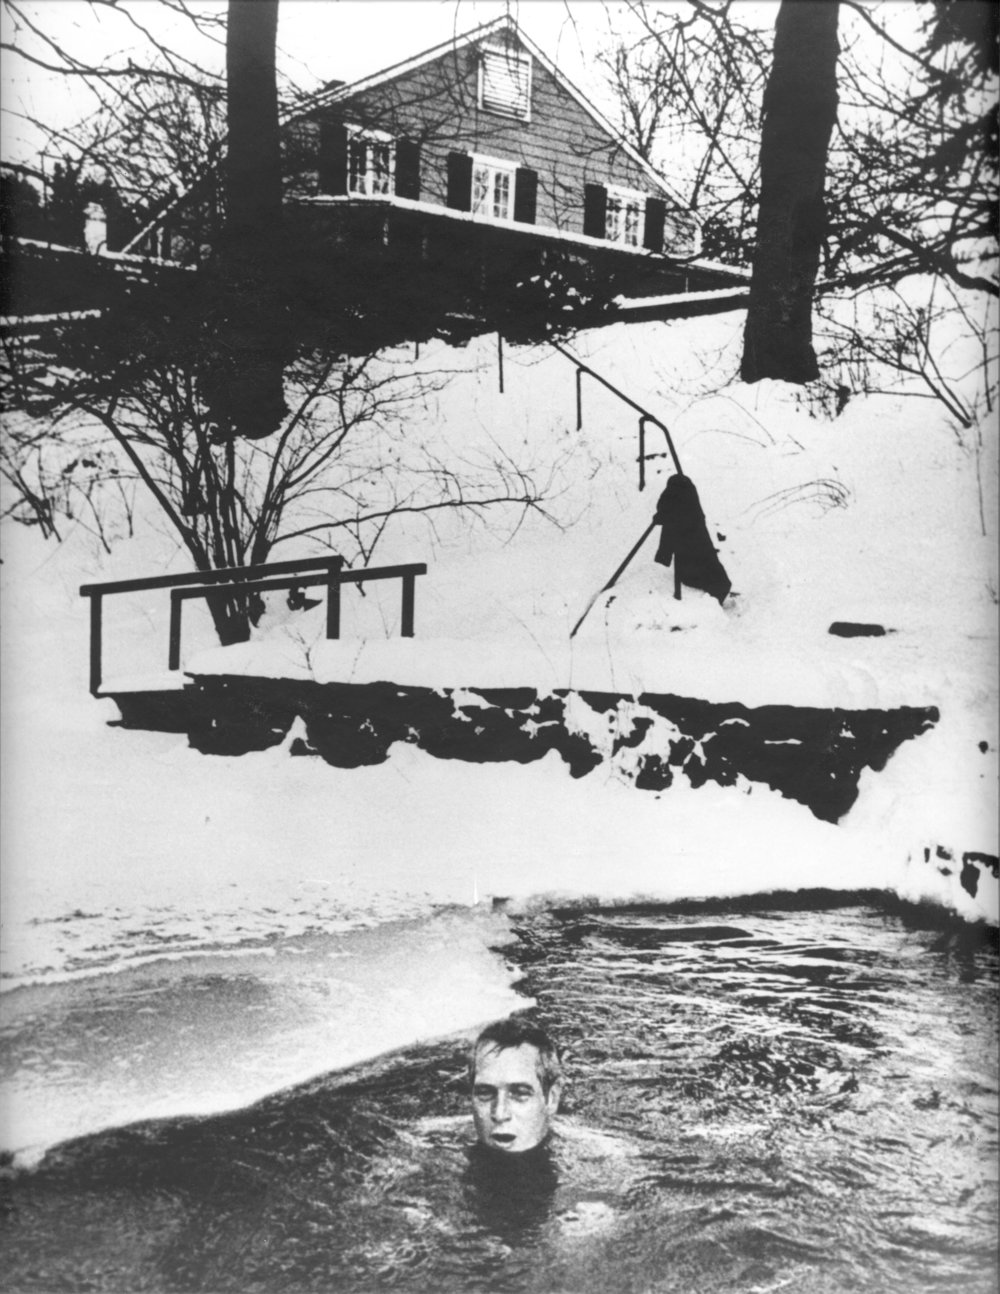 Paul Newman enjoying a winter swim in the Aspetuck river which runs through the preserve.